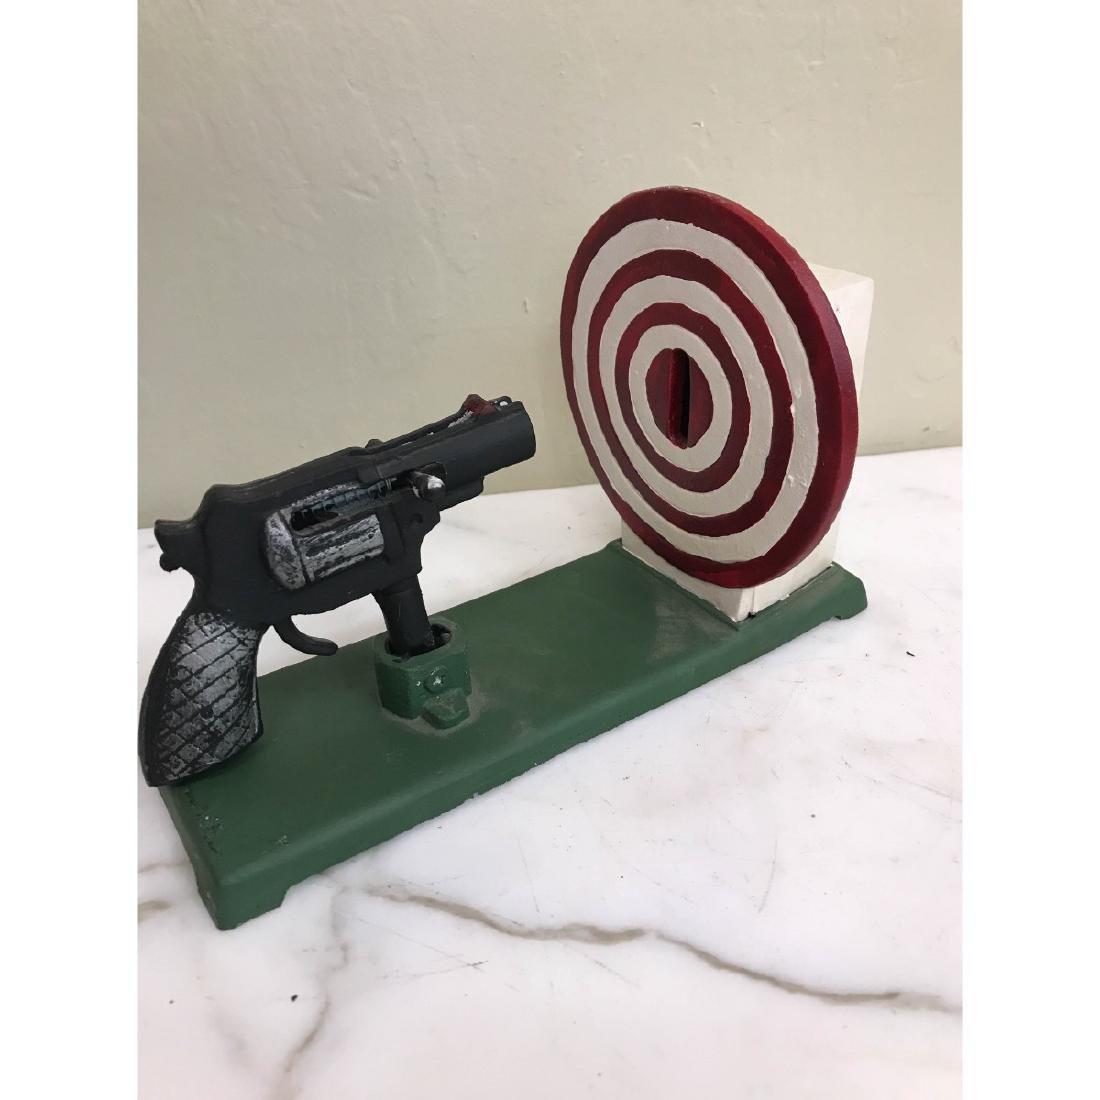 Gun and Target Mechanical Bank